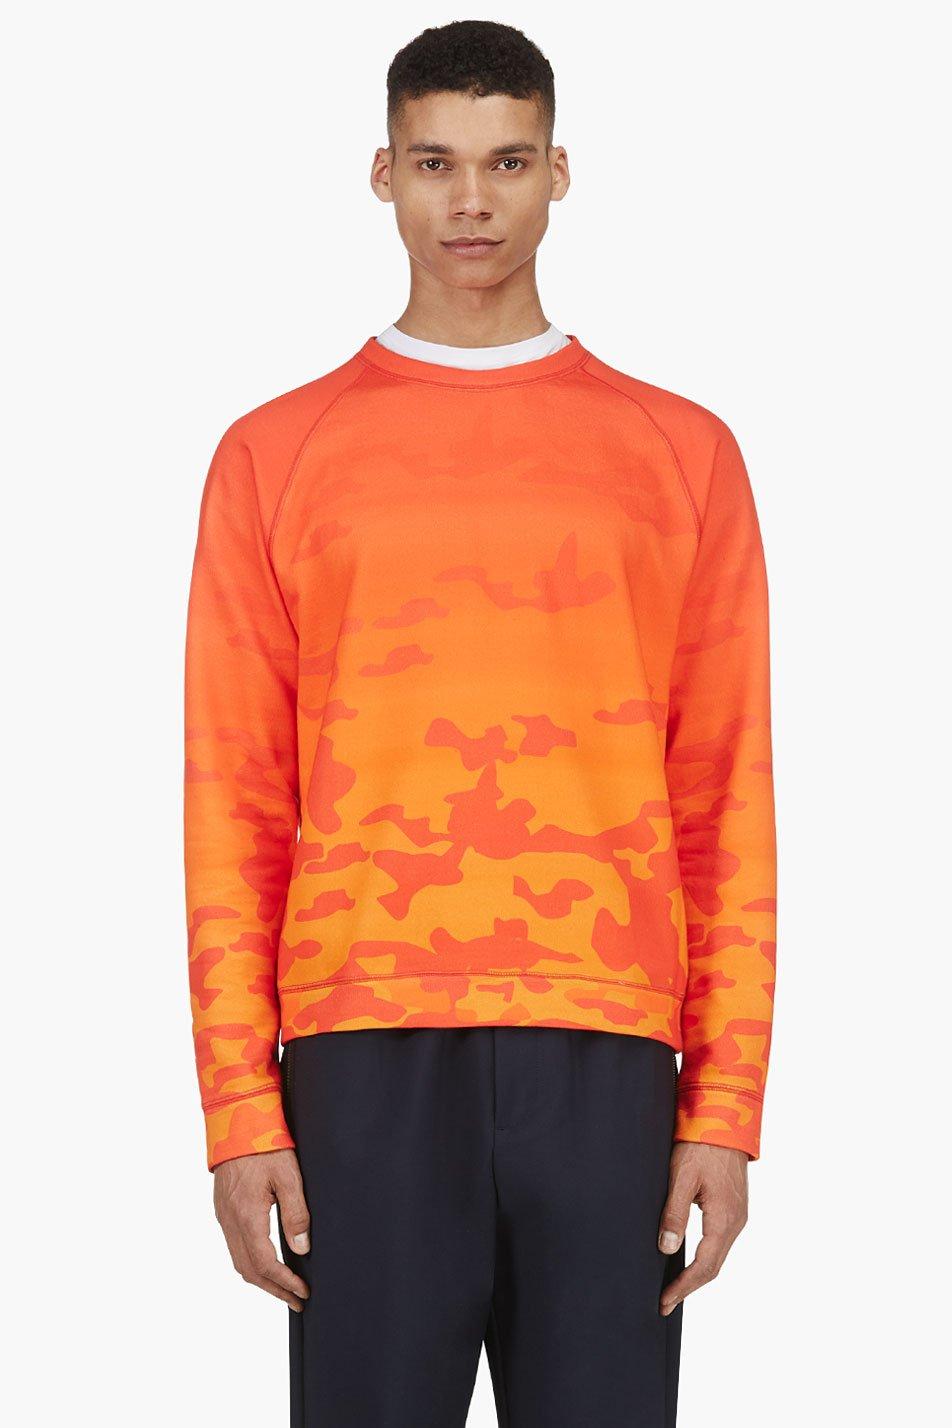 katie eary vermilion sunset camo crewneck sweater